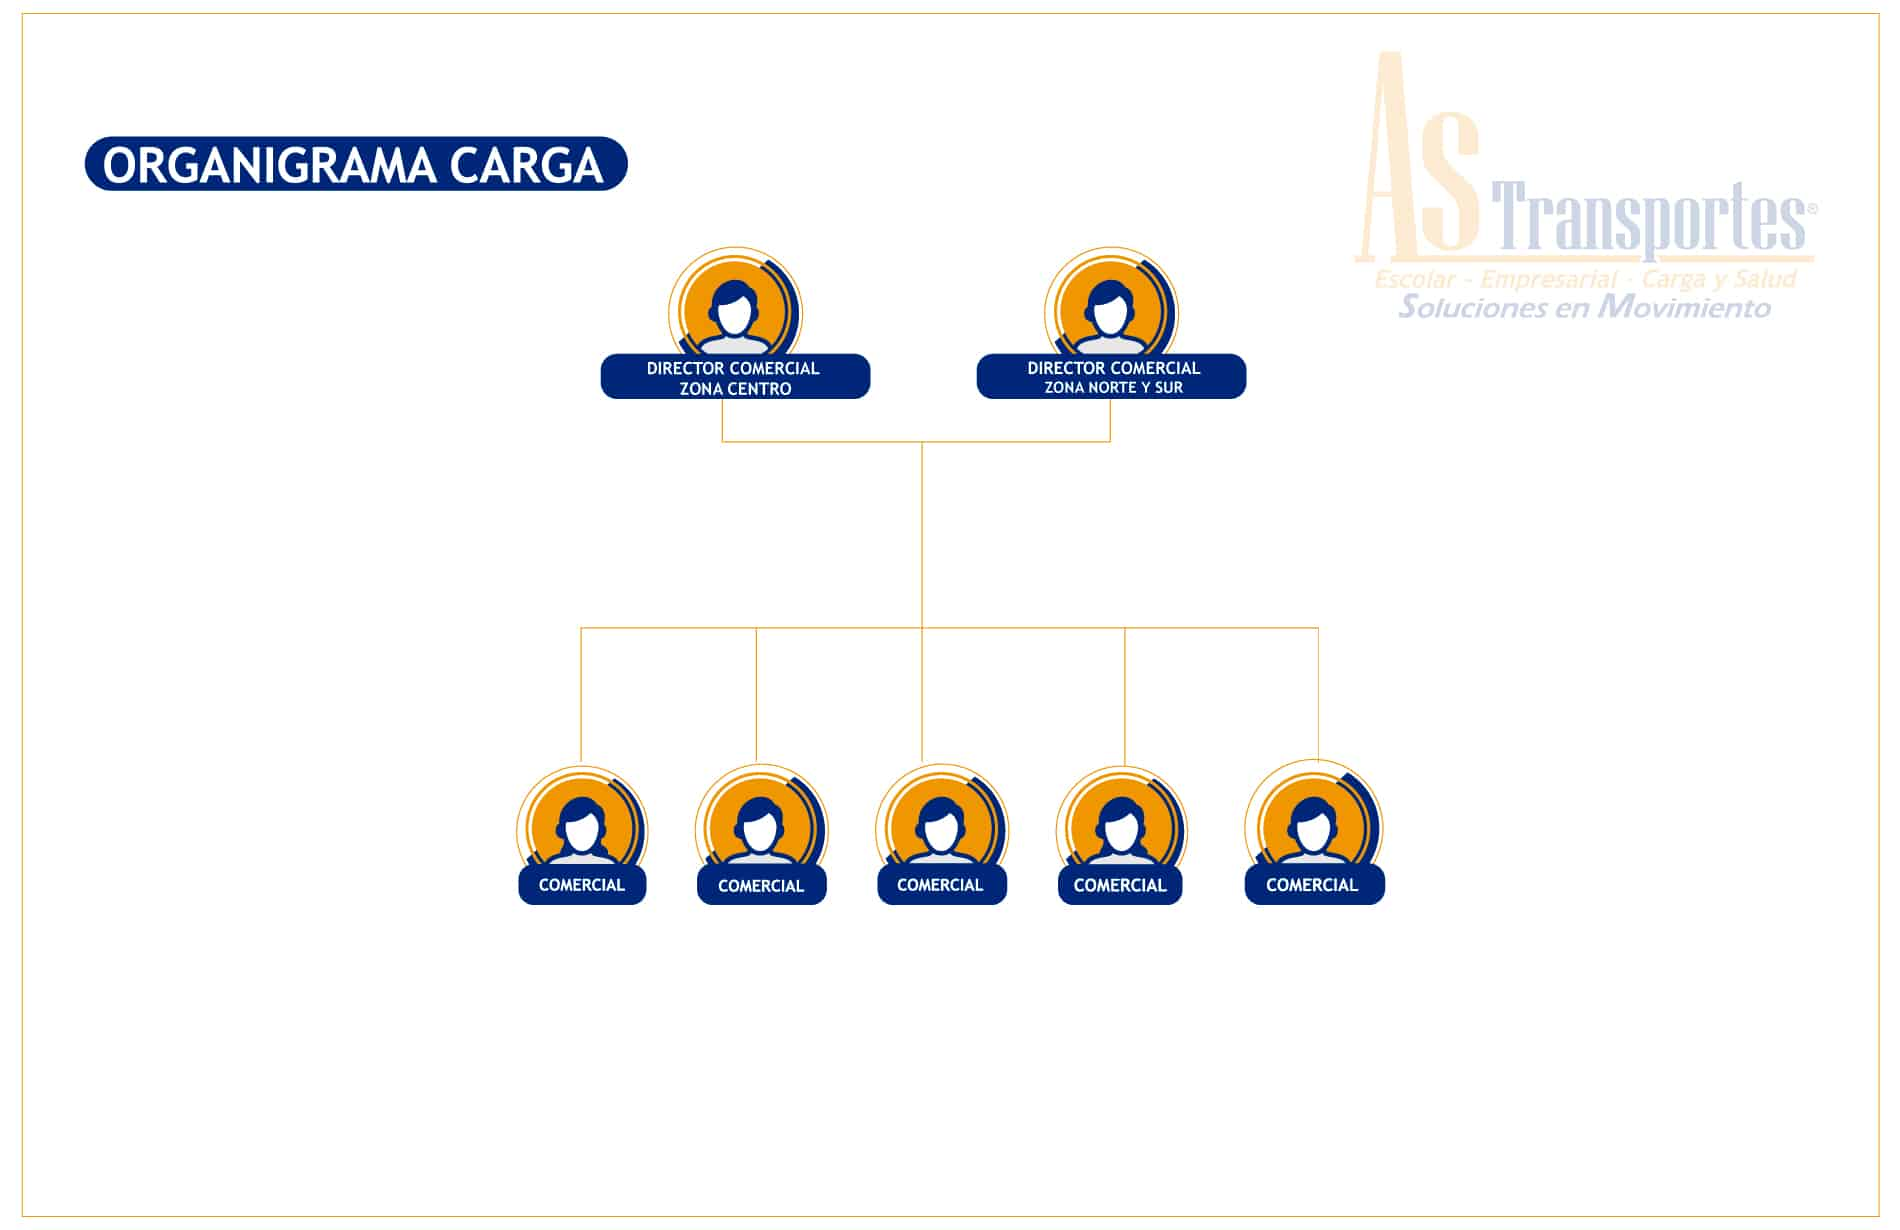 ORGANIGRAMA DE PAGINA WEB COMERCIAL CARGA